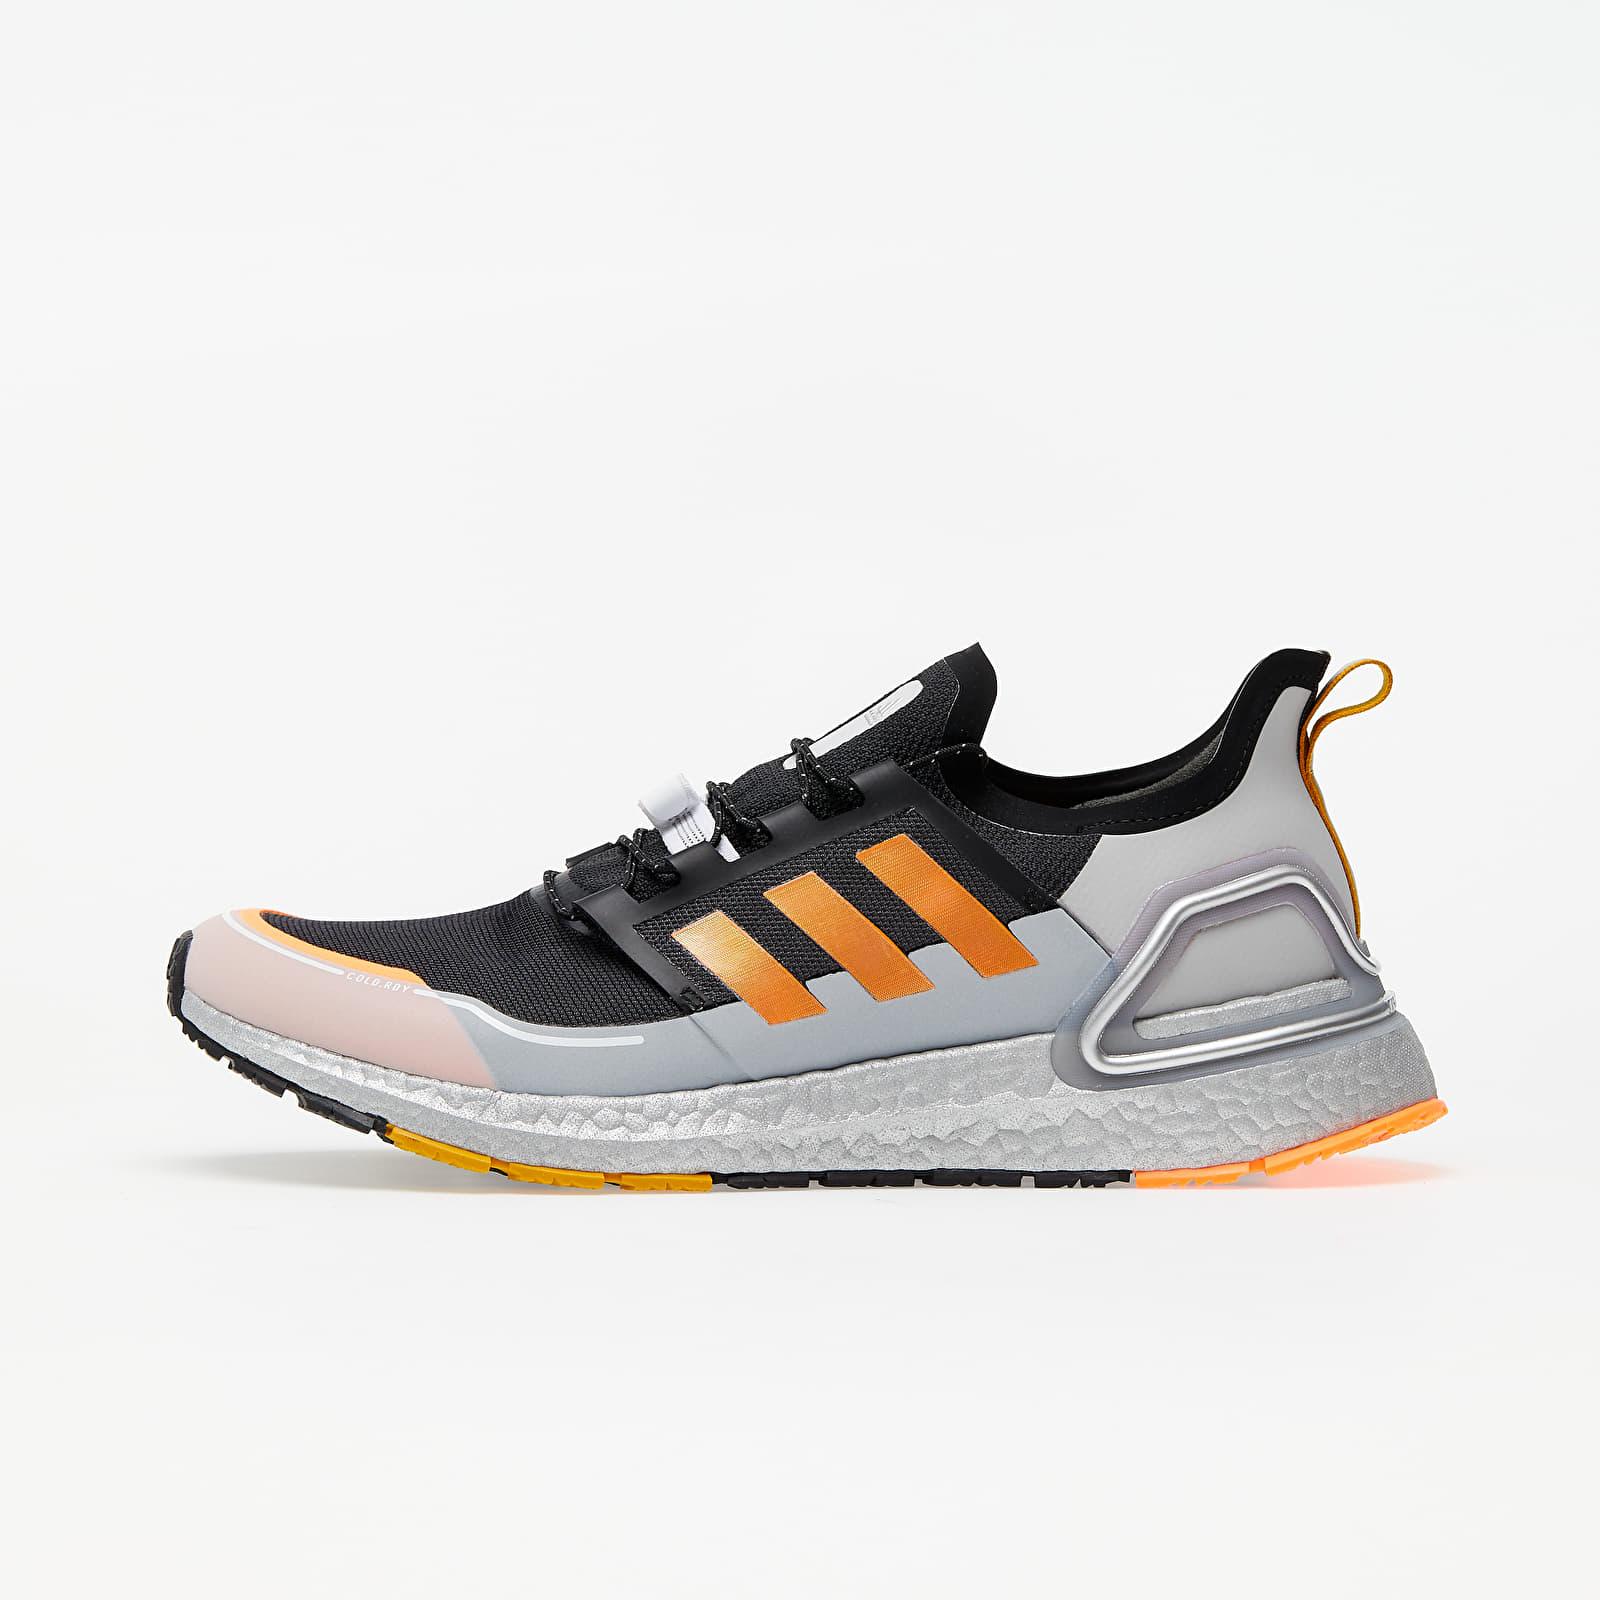 Pánske tenisky a topánky adidas UltraBOOST COLD.RDY Core Black/ Signature Orange/ Legend Gold